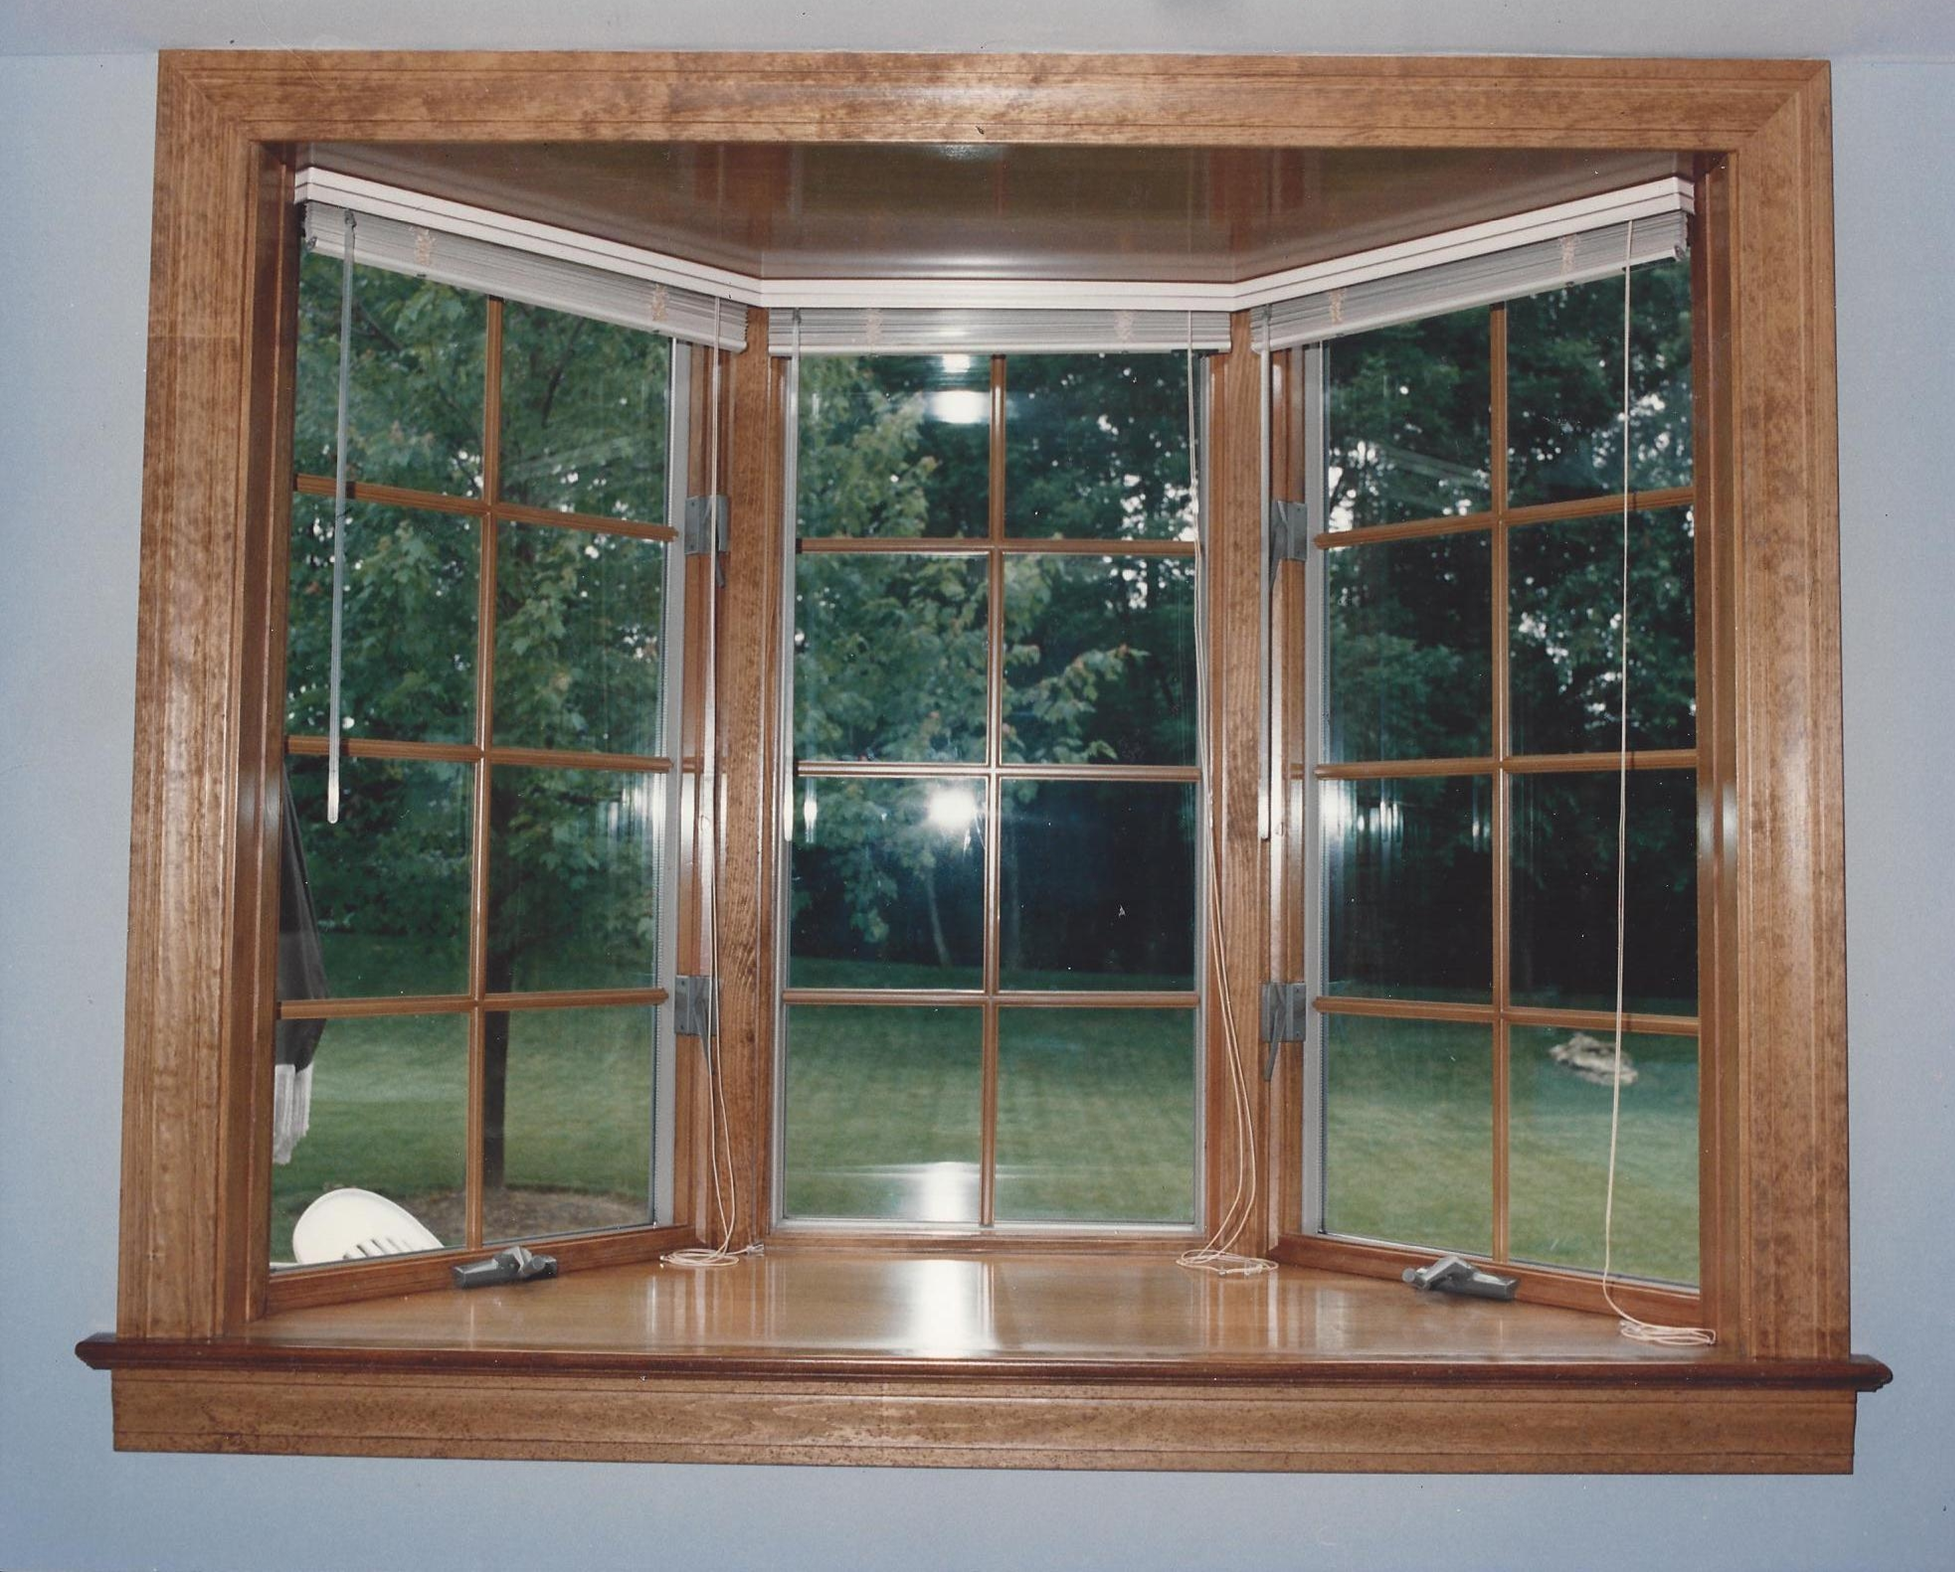 Bay window basics jfk window door forest park nearsay for Bay window interior